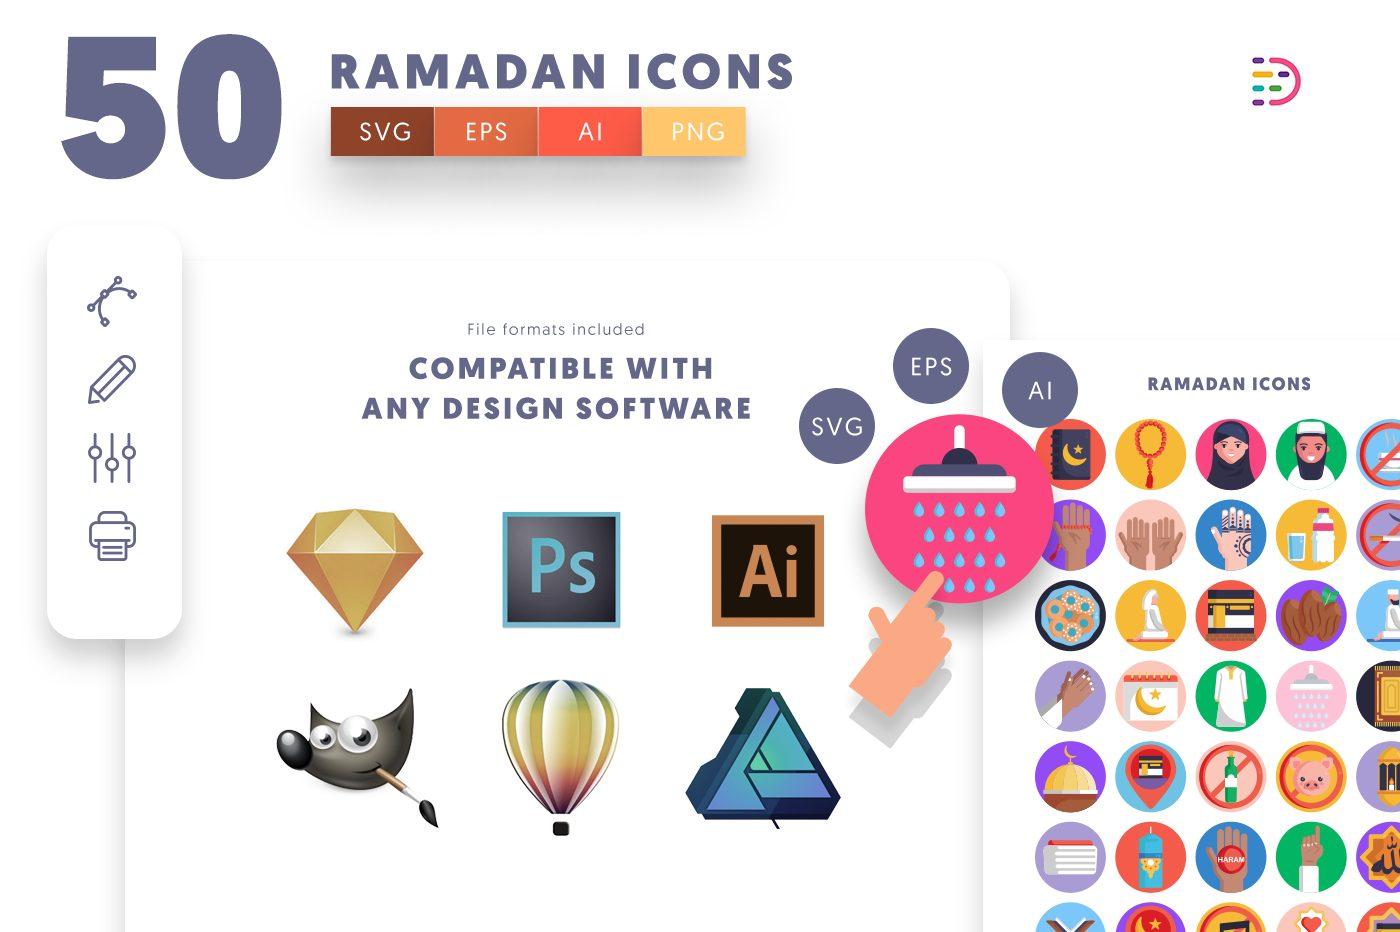 full vector 50 Ramadan Icons EPS, SVG, PNG